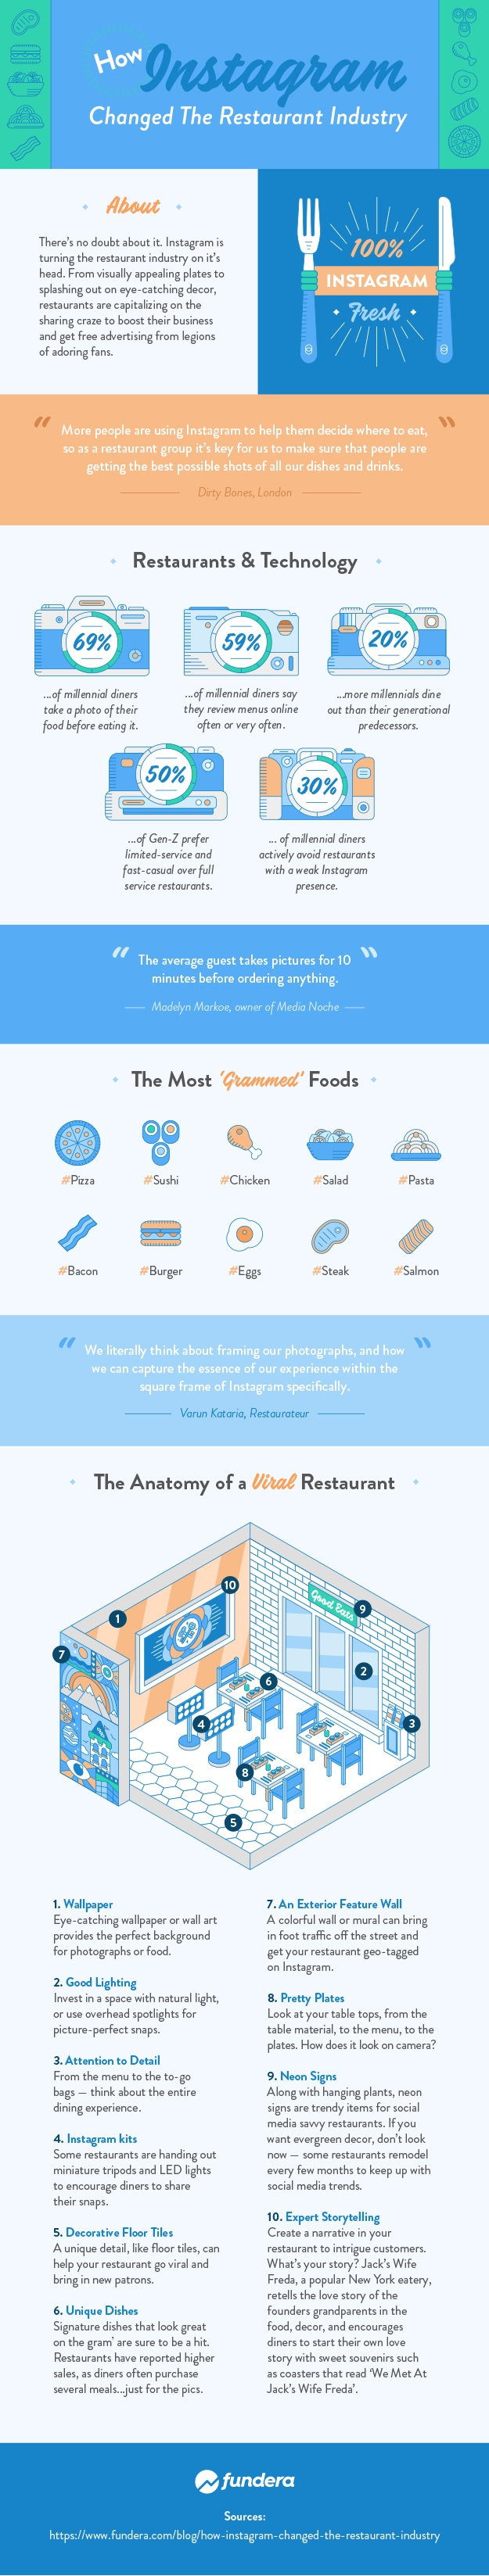 Instagram Restaurant info